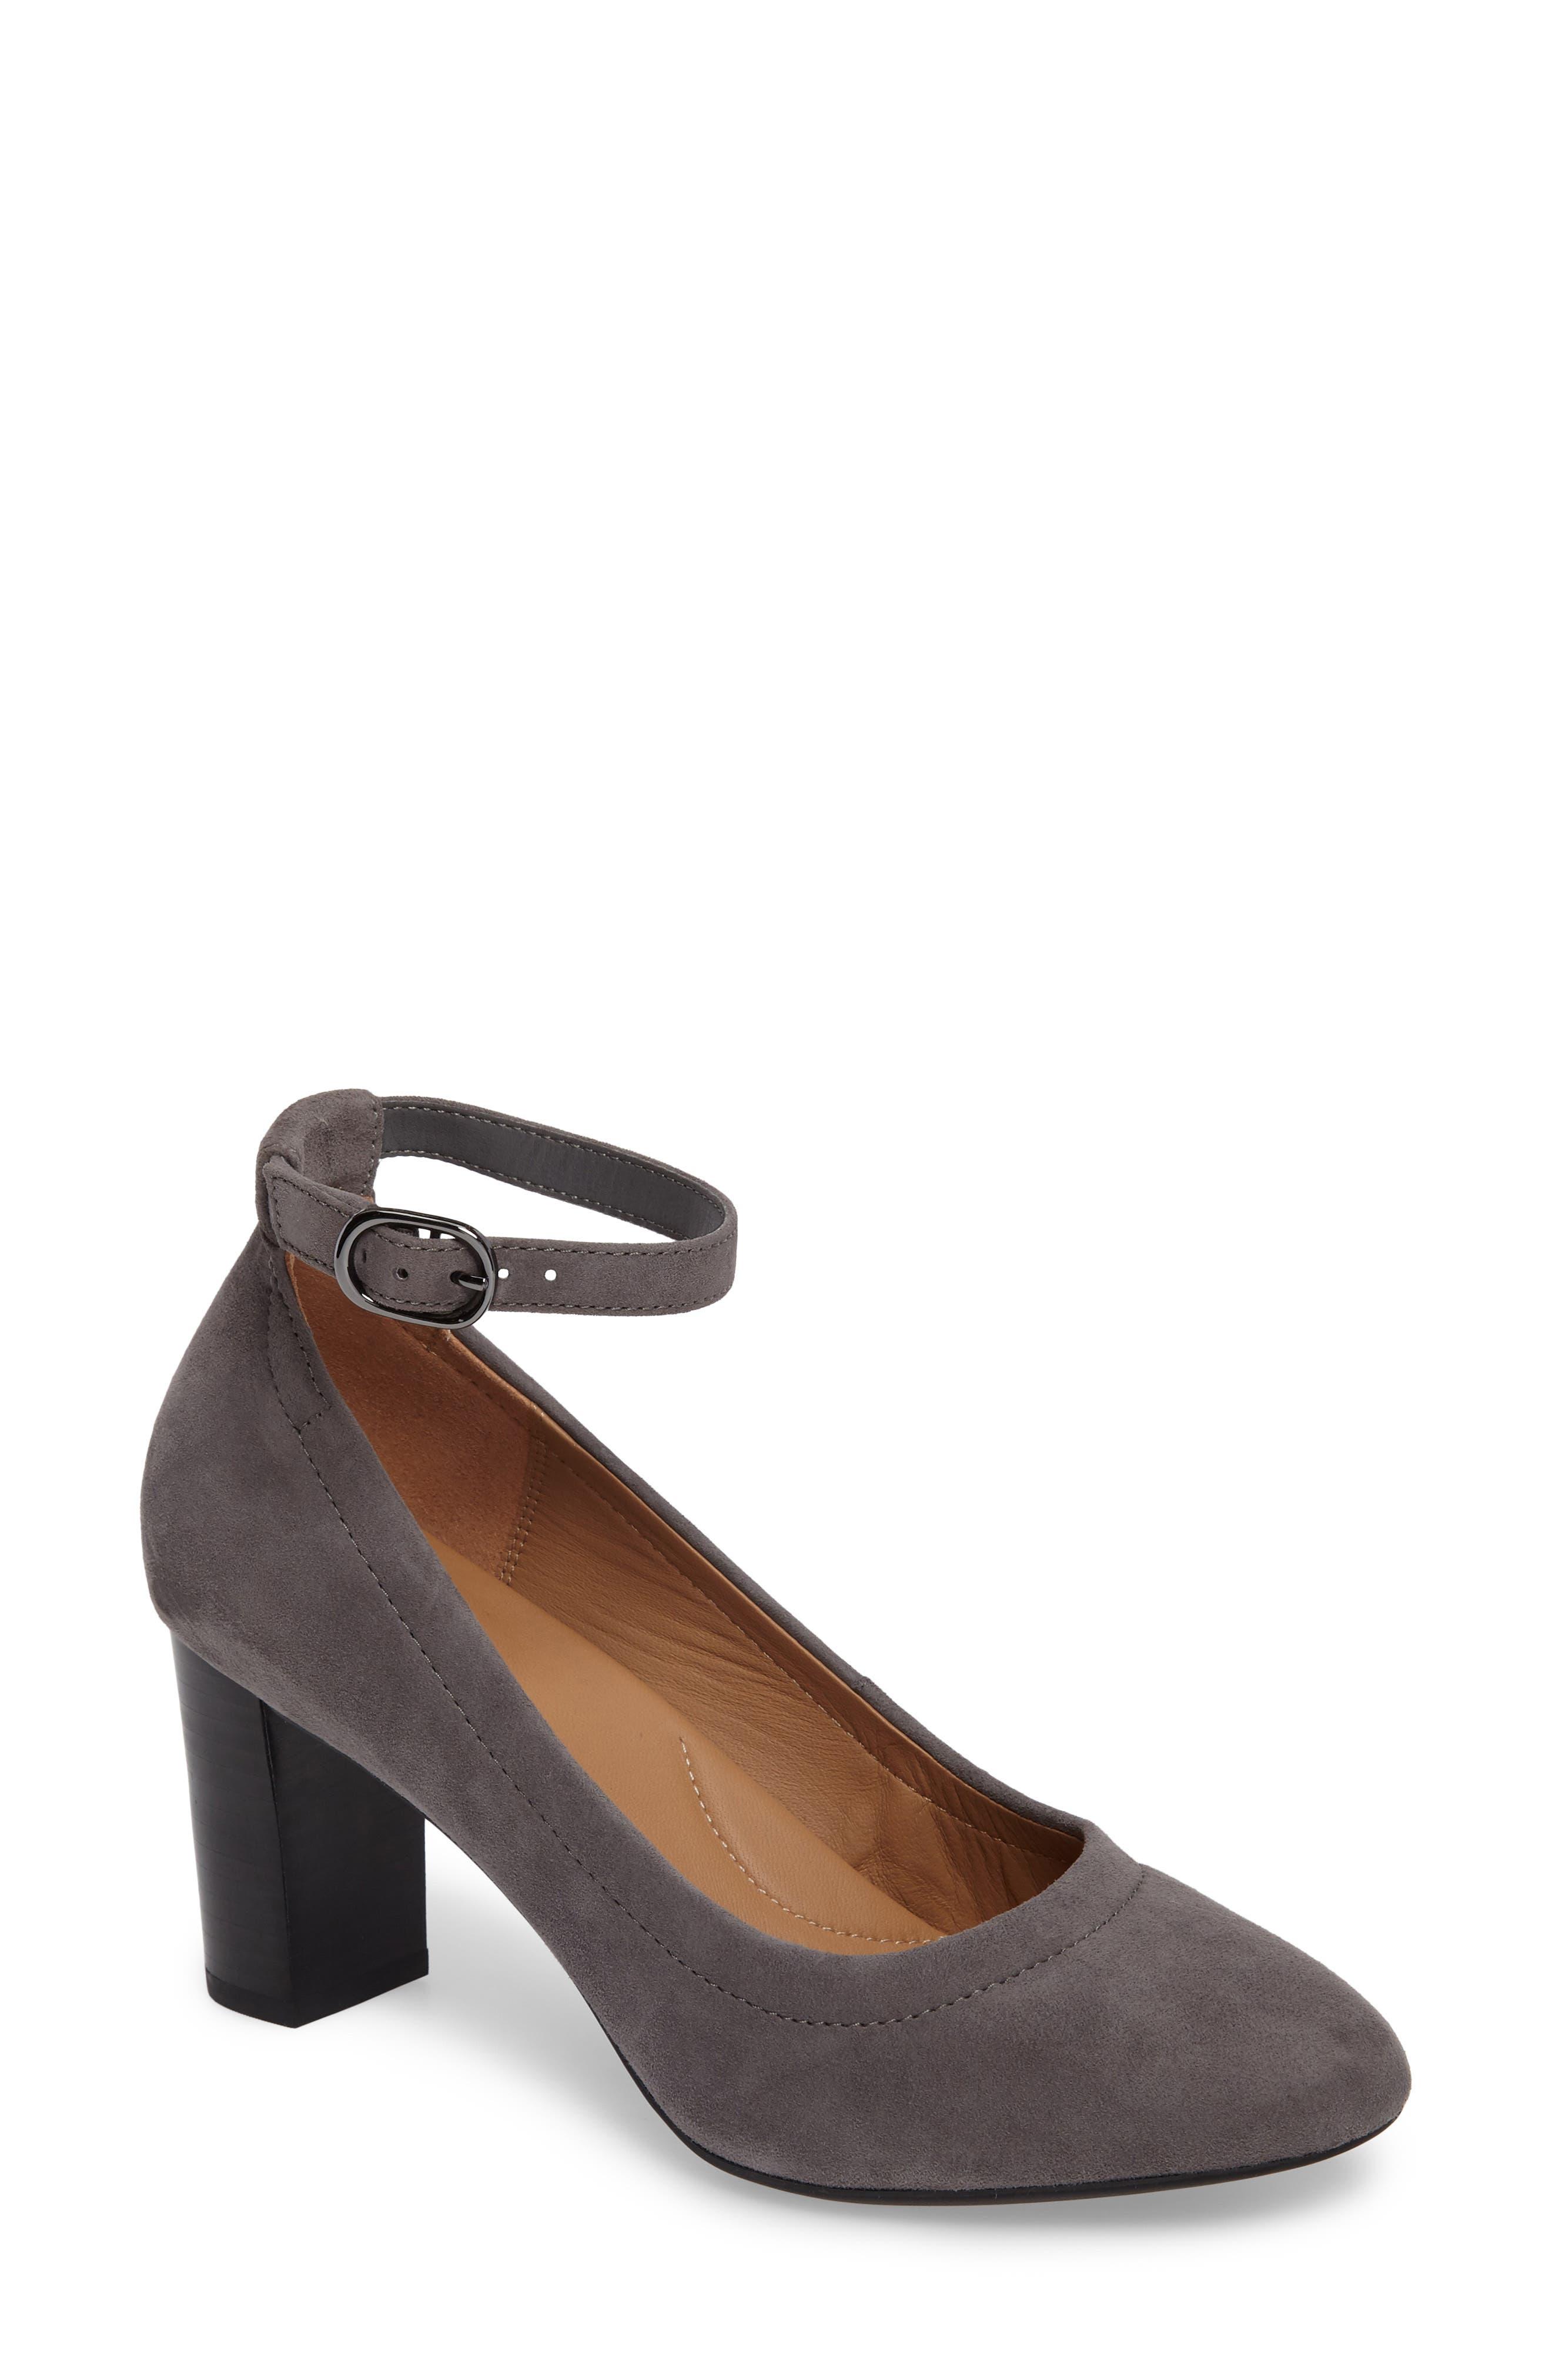 Main Image - Clarks® Chryssa Jana Ankle Strap Pump (Women)